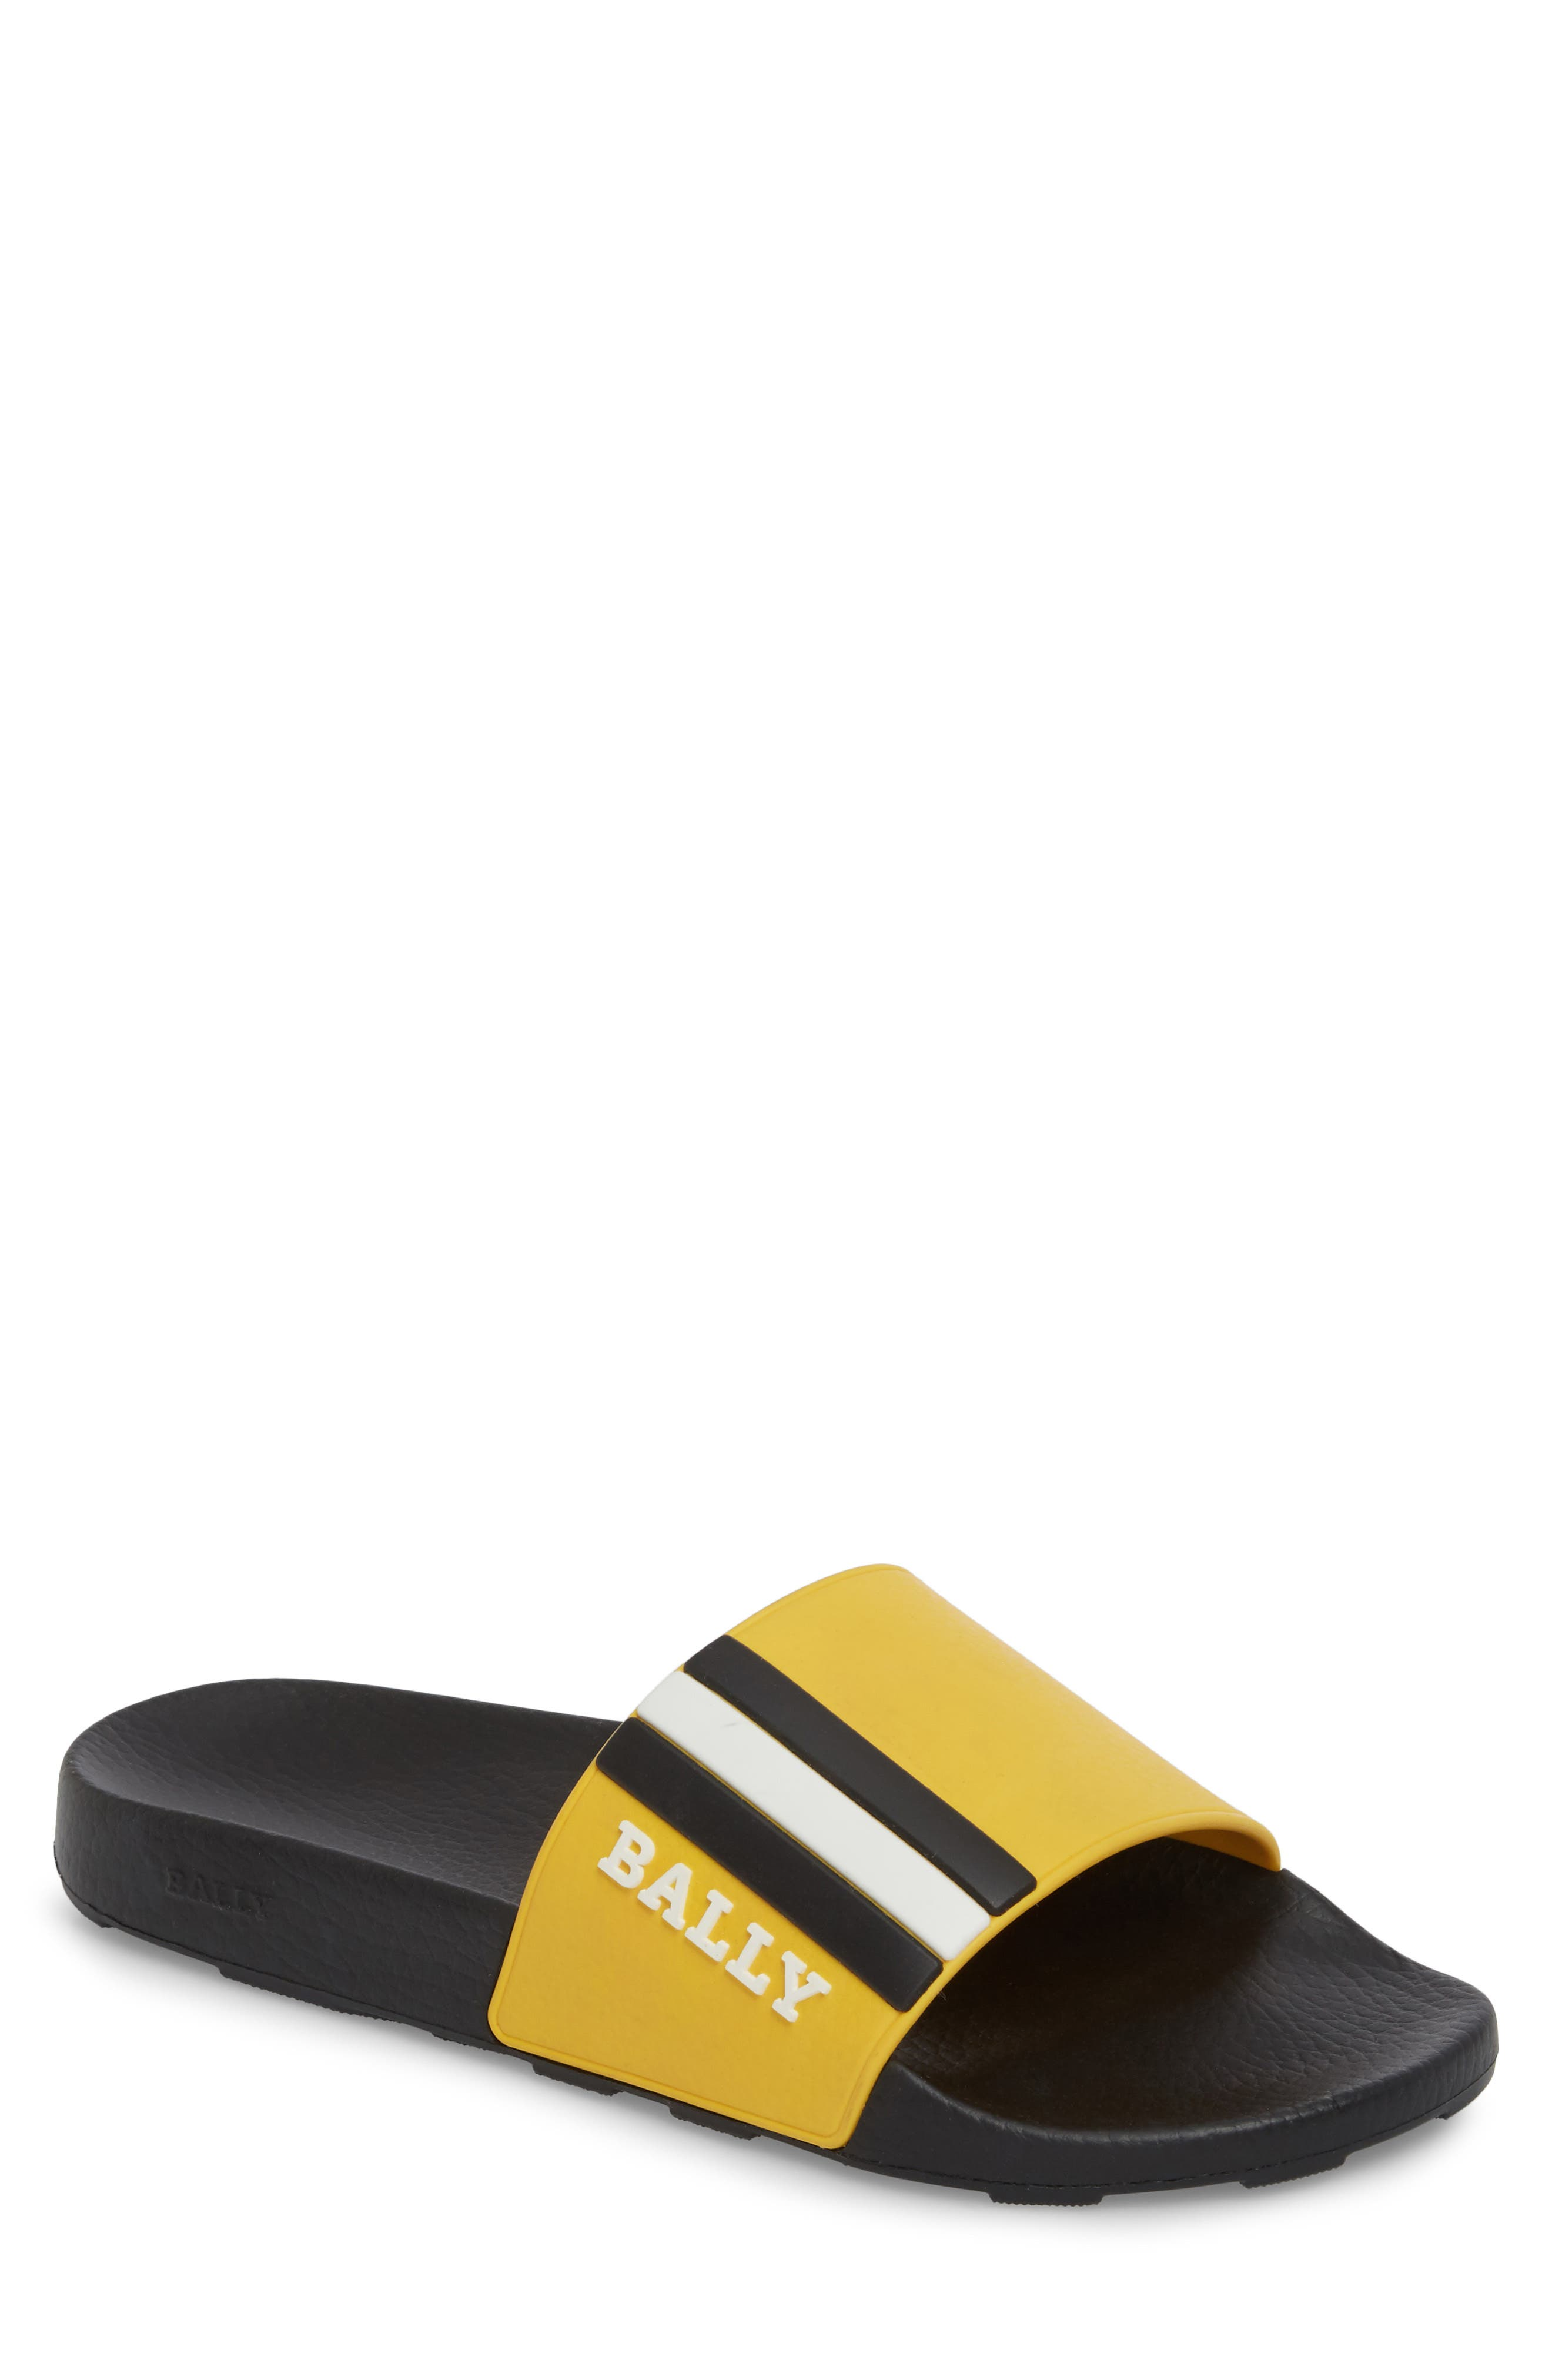 Saxor Slide Sandal,                         Main,                         color, Kodak